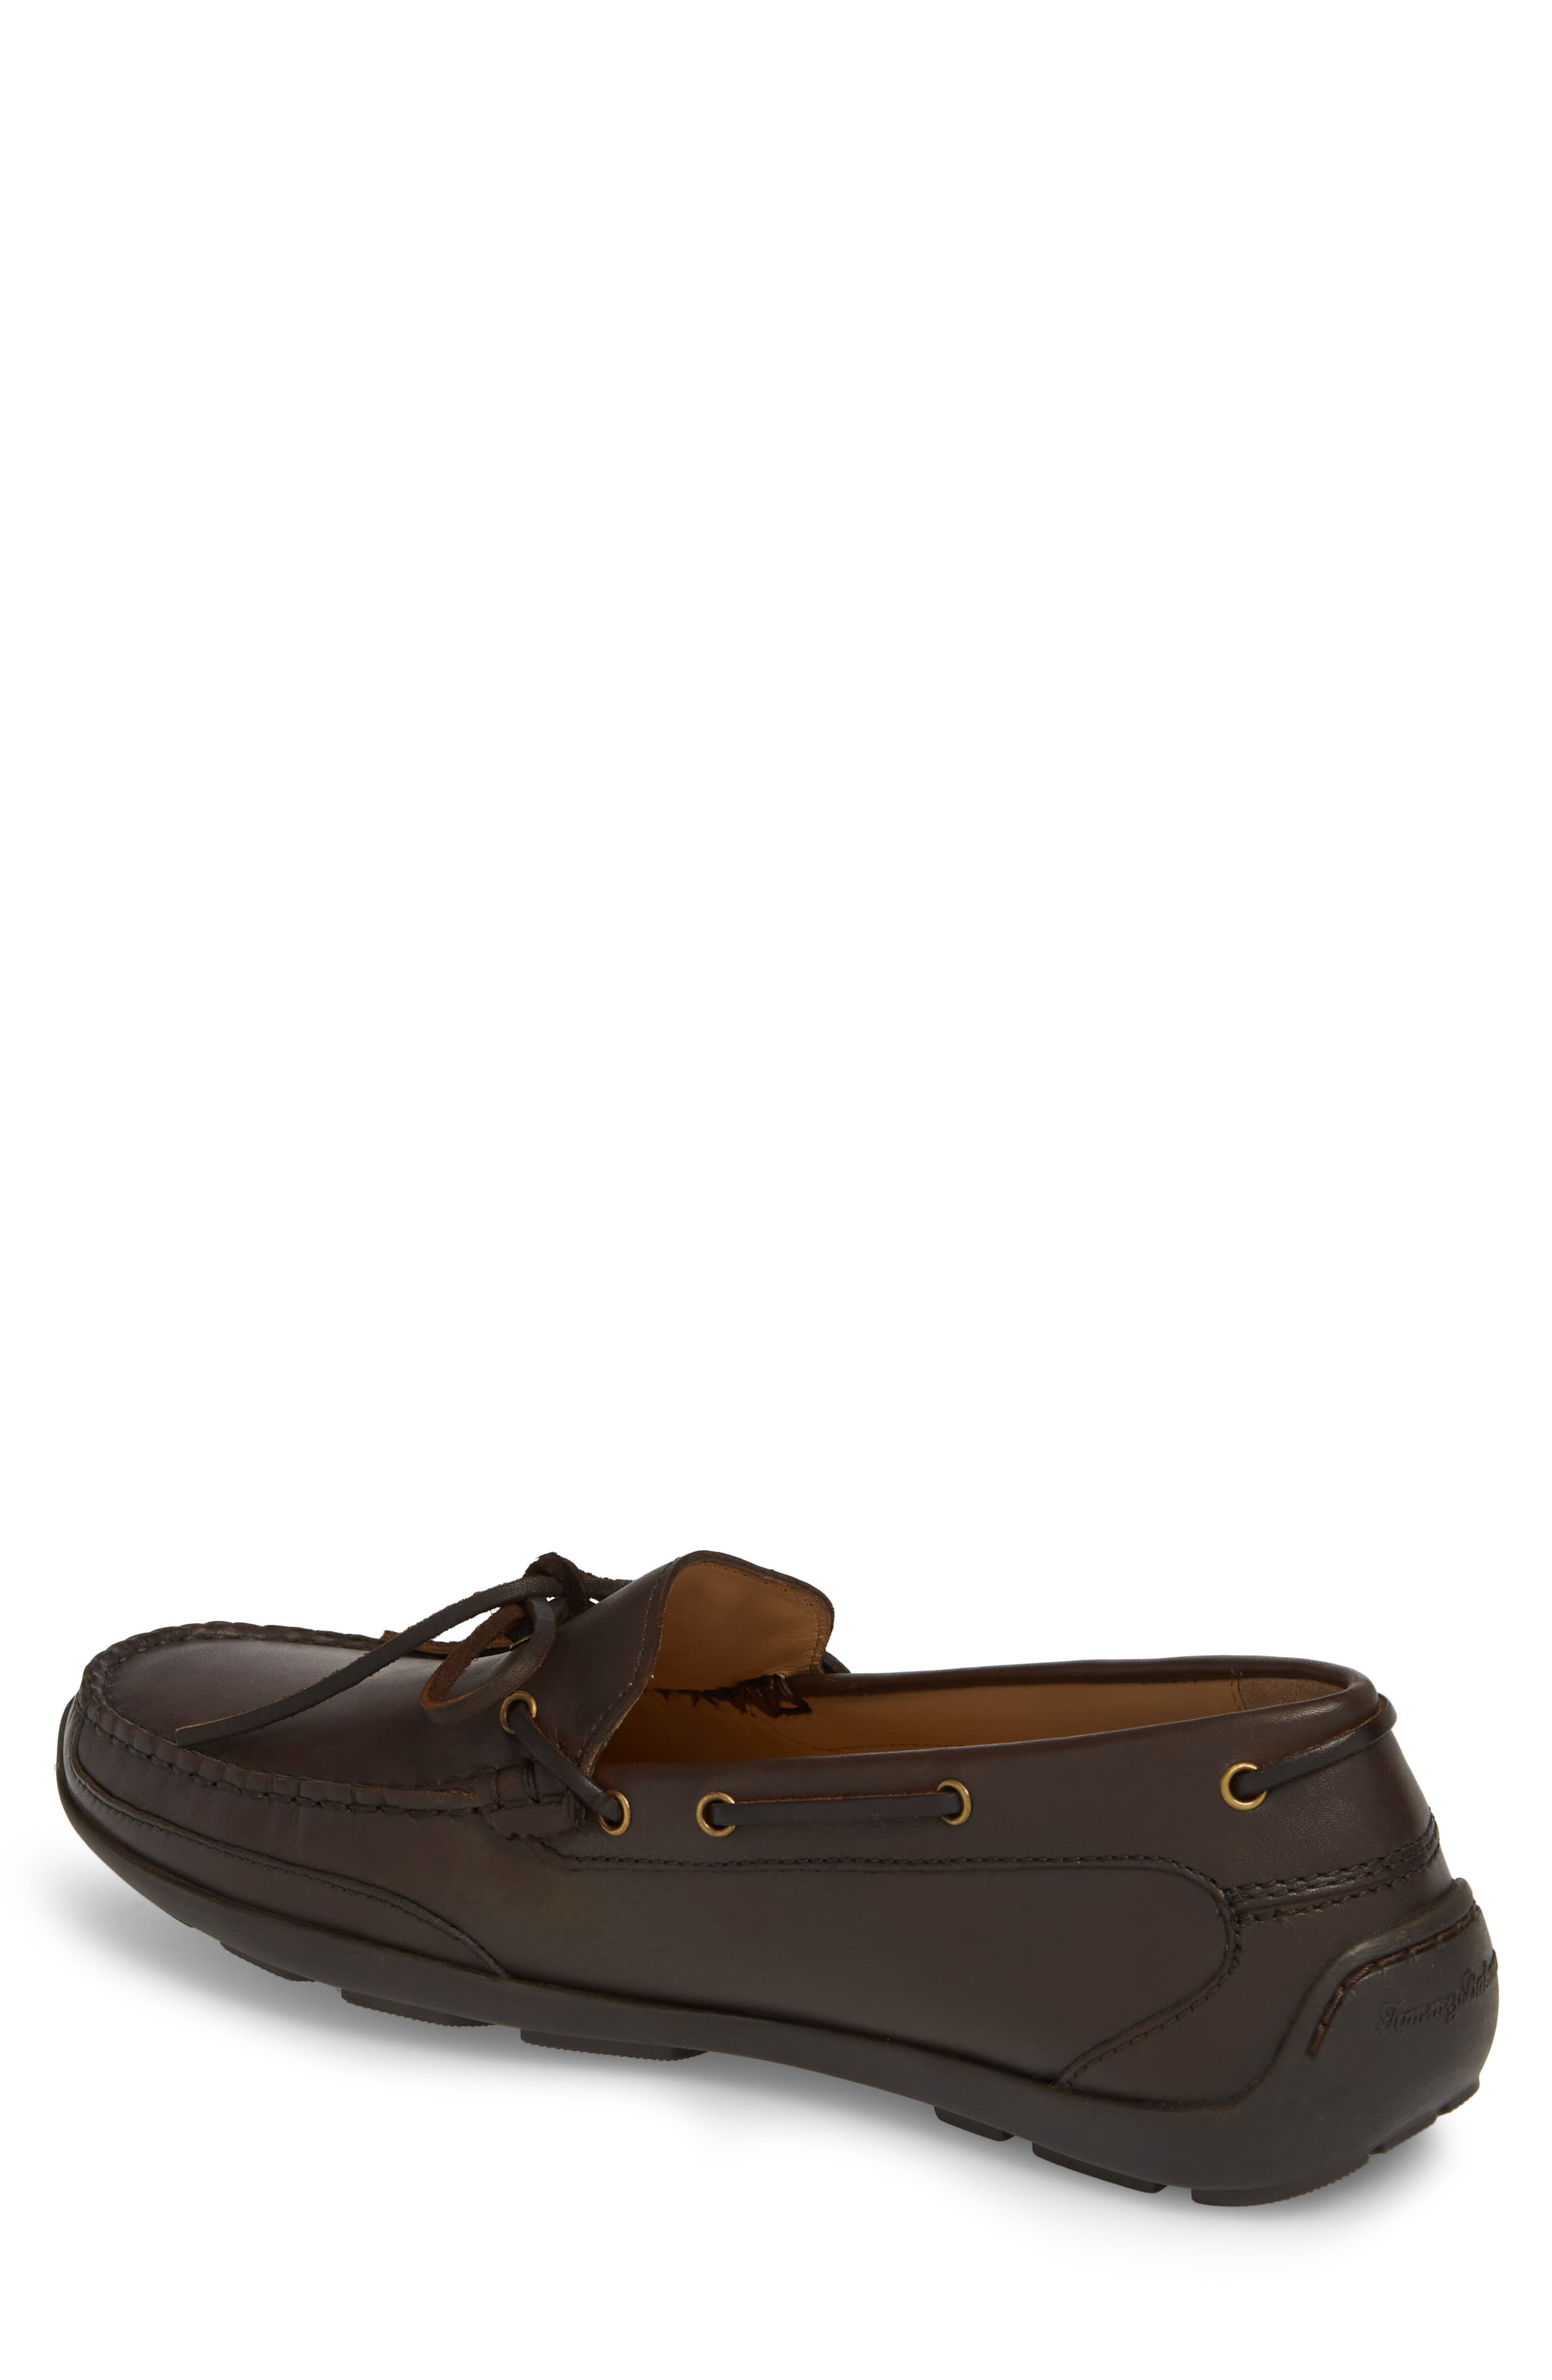 Tangier Driving Shoe,                             Alternate thumbnail 2, color,                             Medium Brown Leather